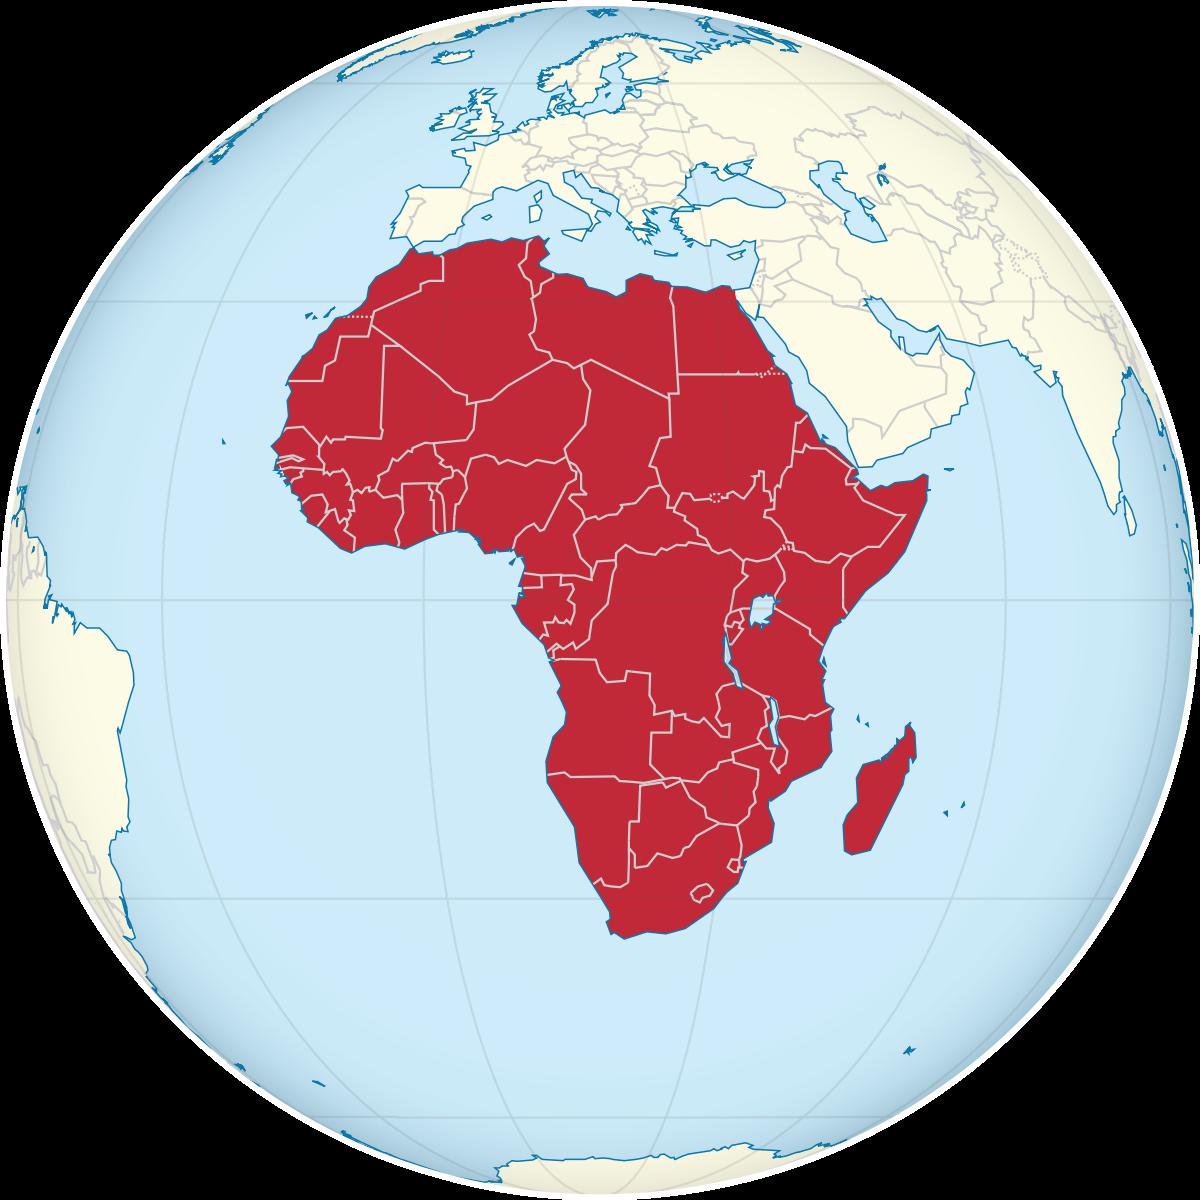 Pan-African Colloquium in Niamey (Niger) on June 10 & 11, 2021